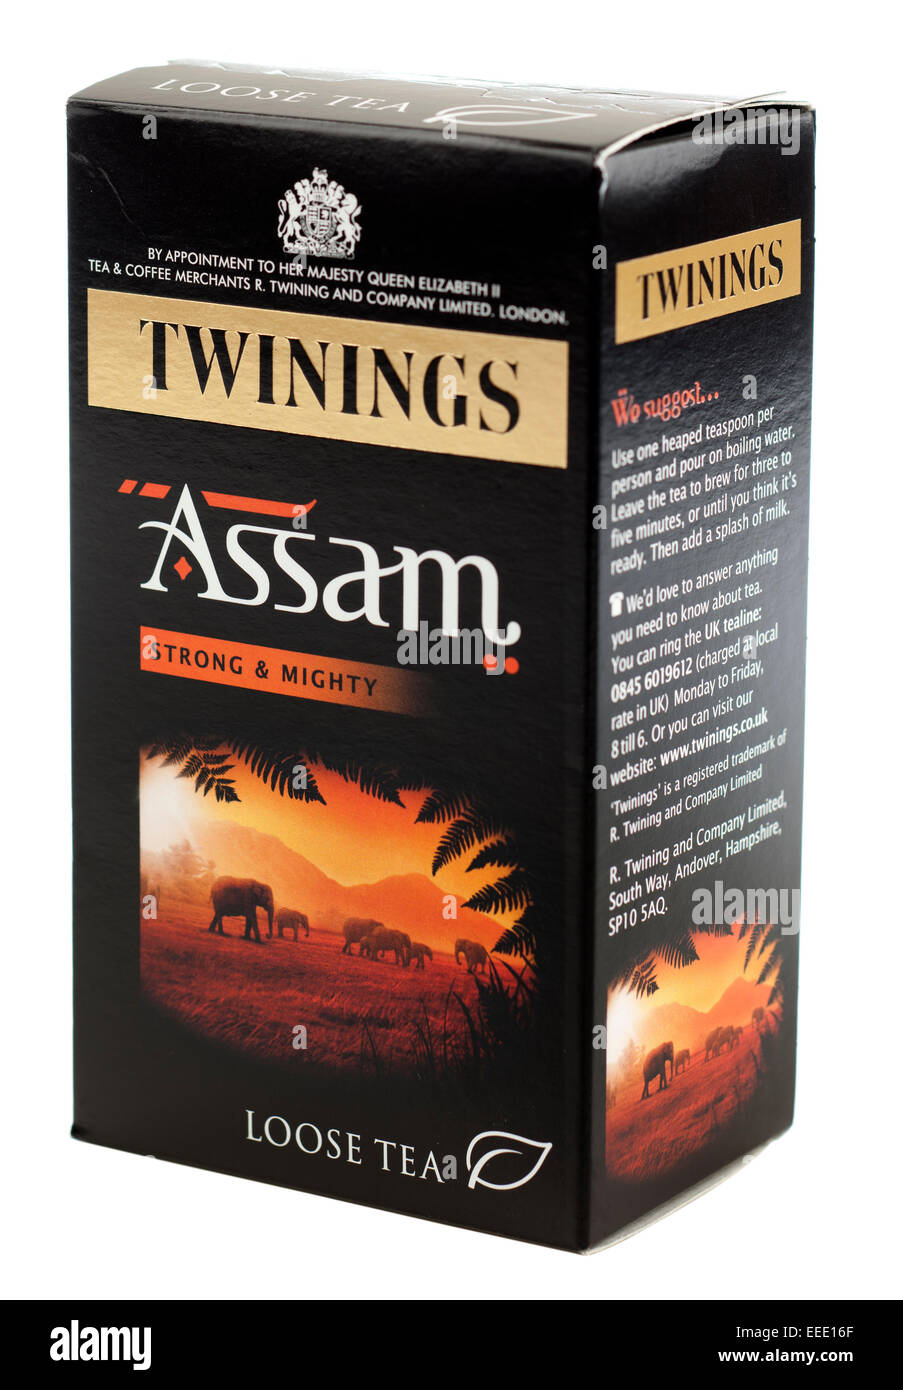 Box of Twinings Assam loose leaf tea - Stock Image